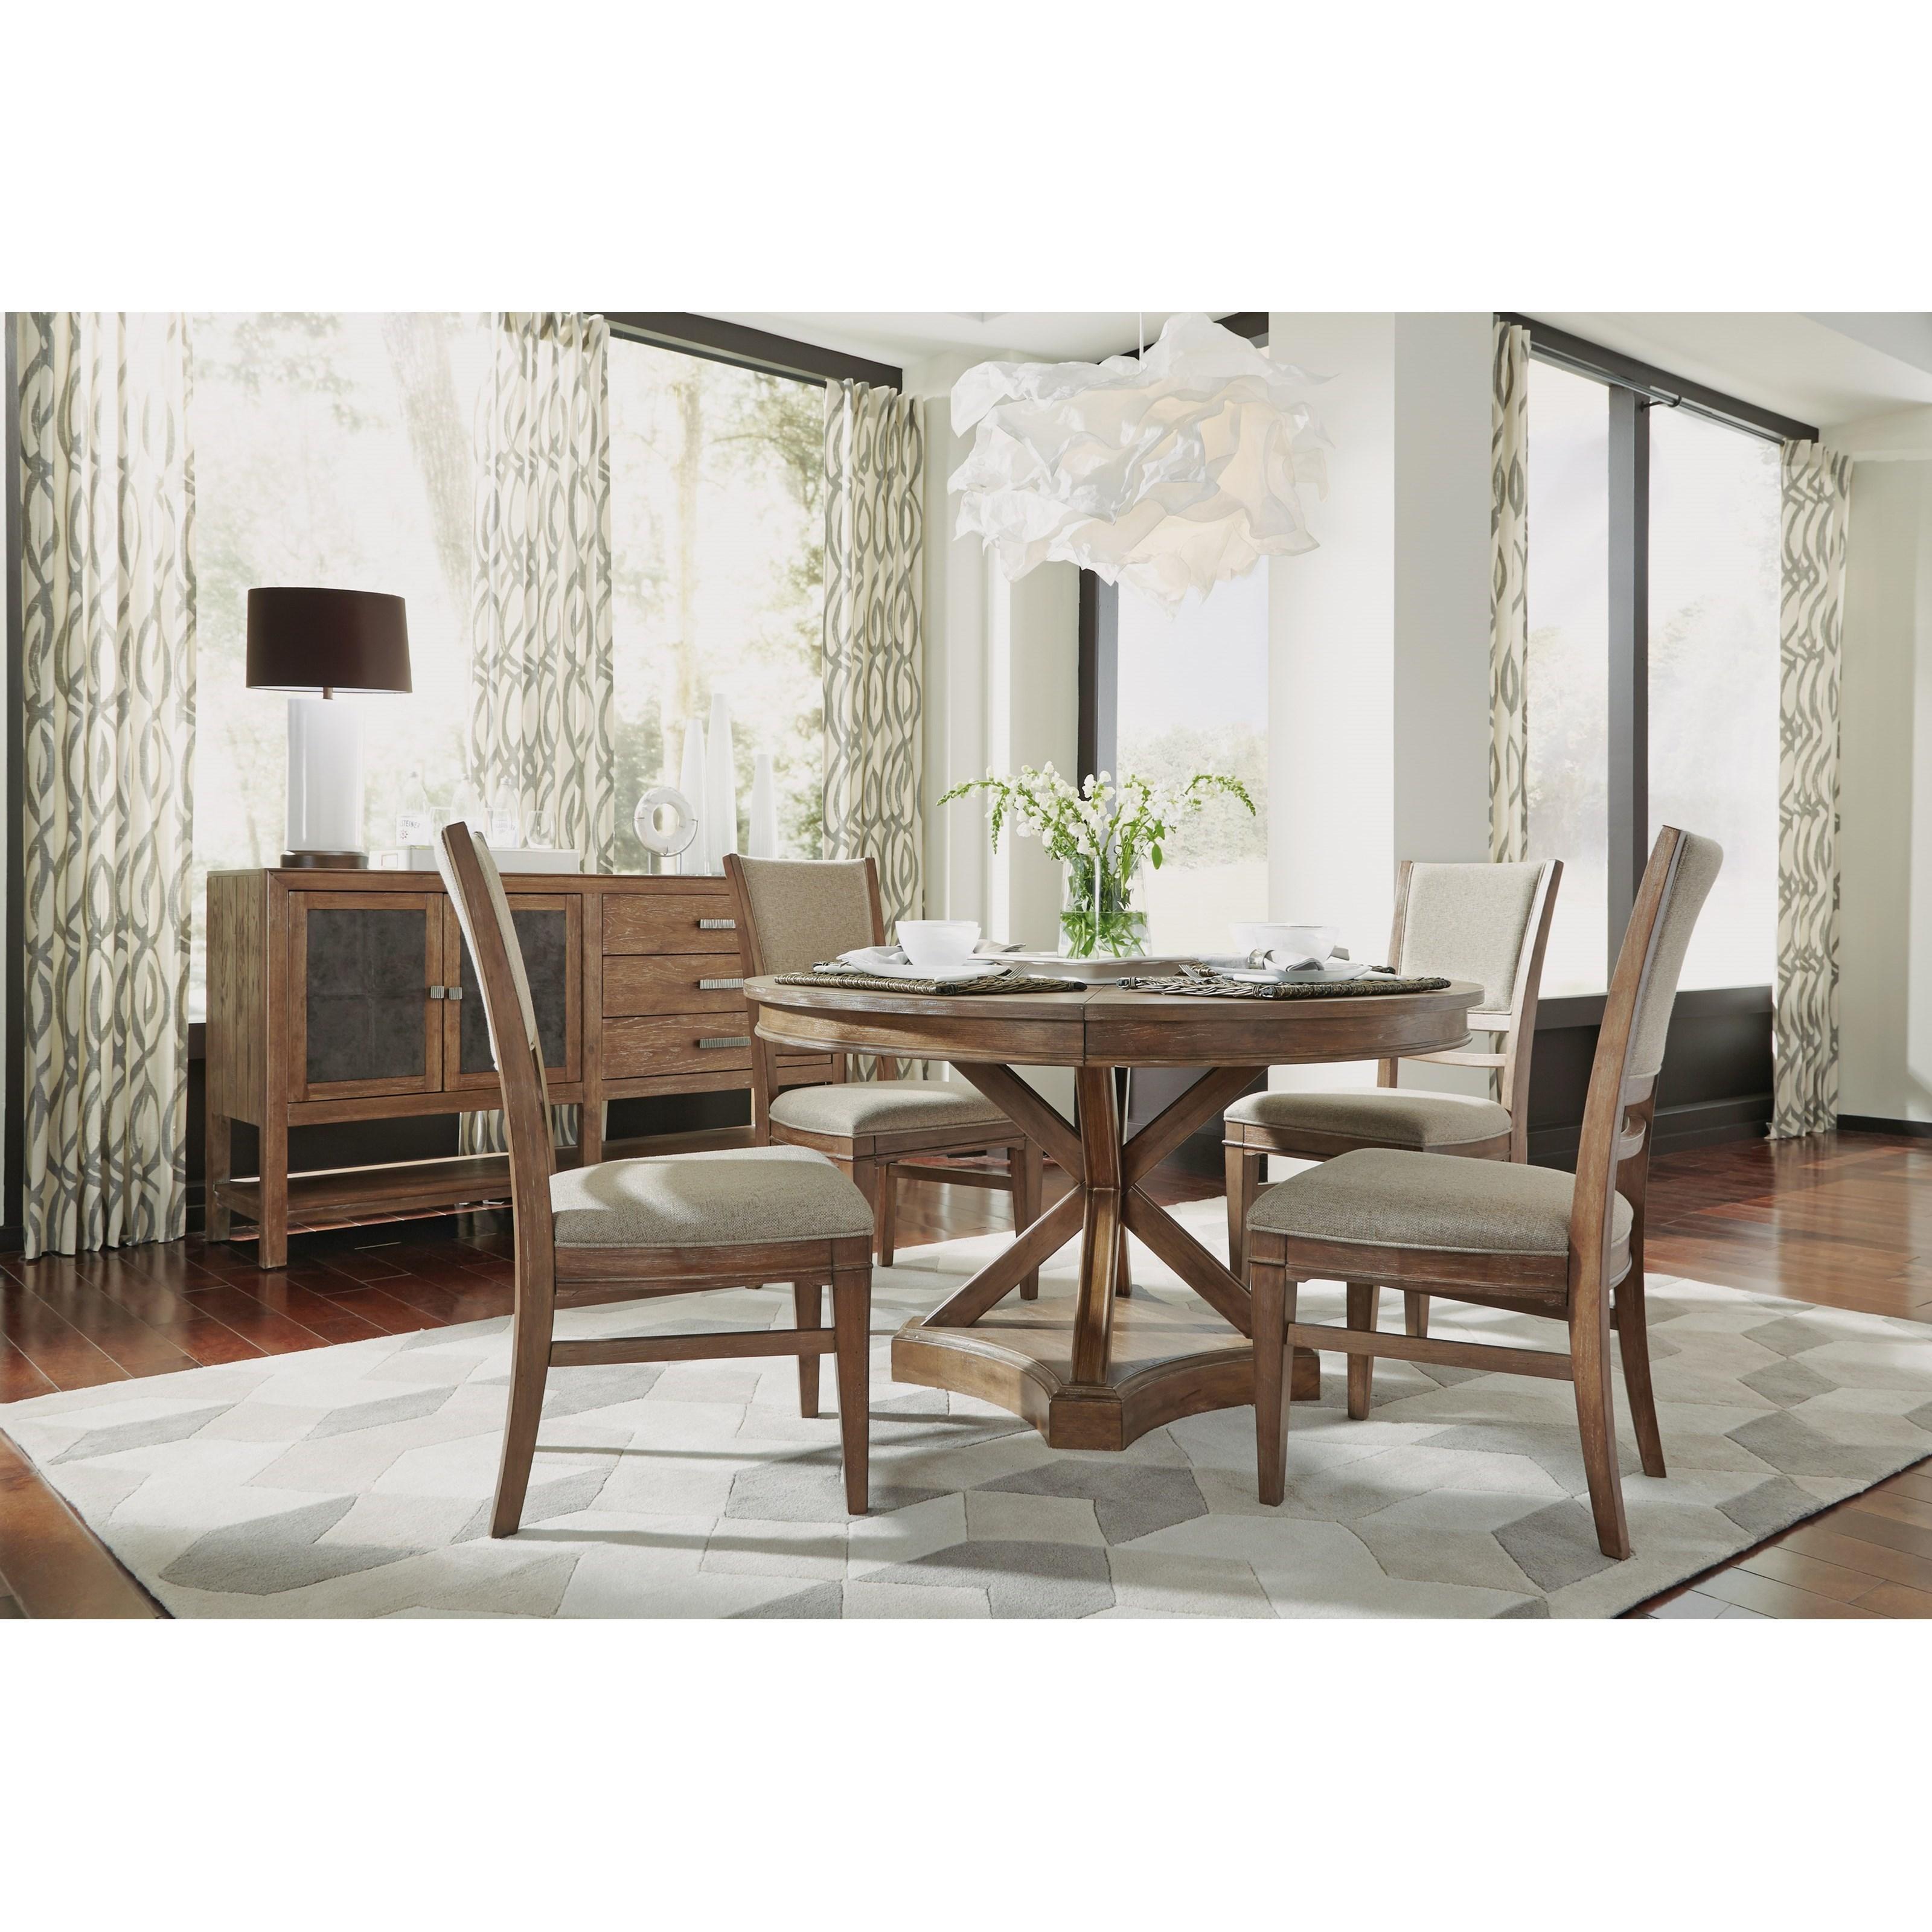 wynwood a flexsteel company hampton dining group rustic. Black Bedroom Furniture Sets. Home Design Ideas